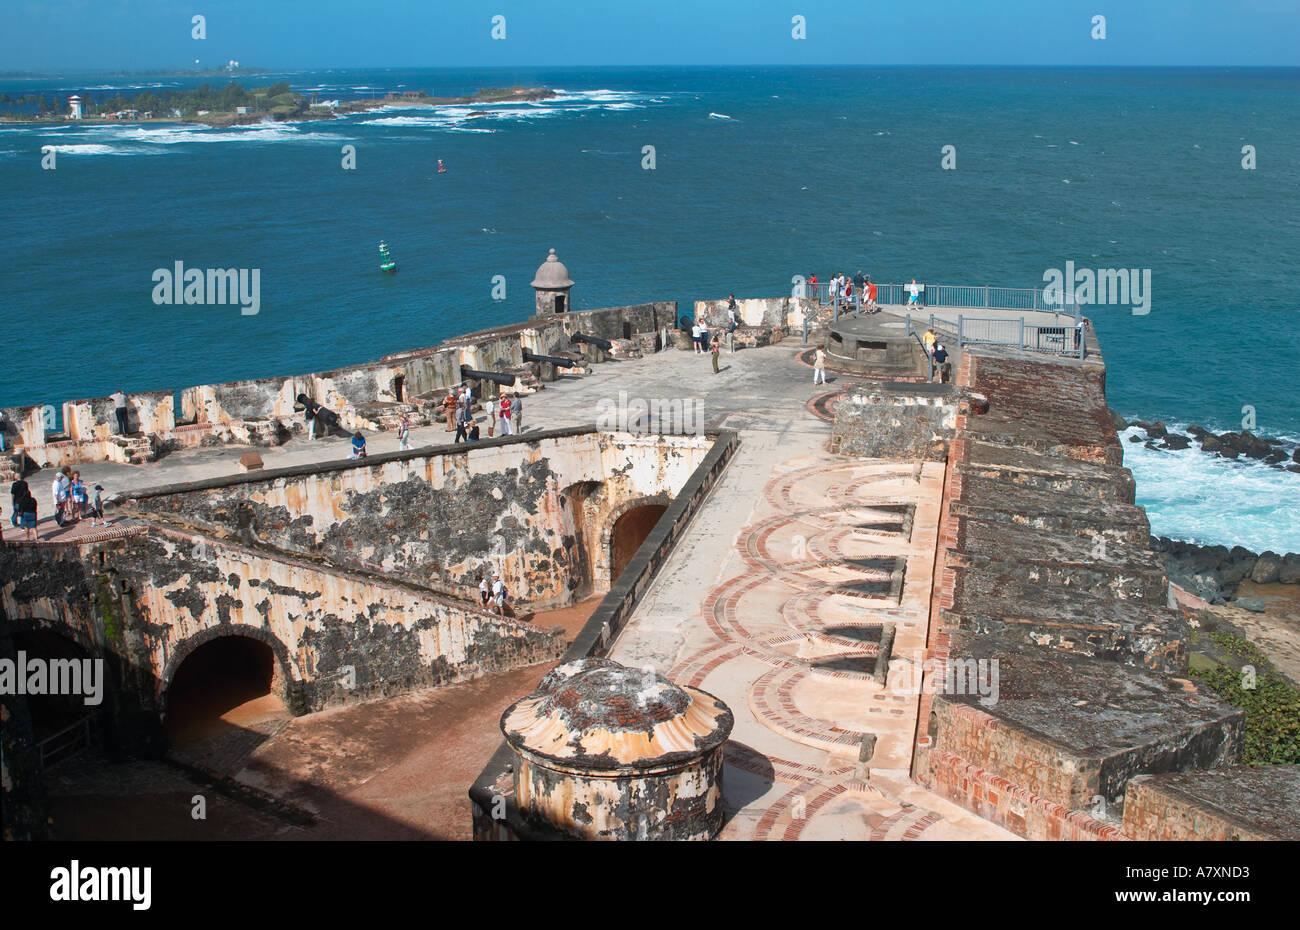 PUERTO RICO San Juan El Morro Fortress Built In 1540 Old San Juan  Observation Deck Spanish Military Fort